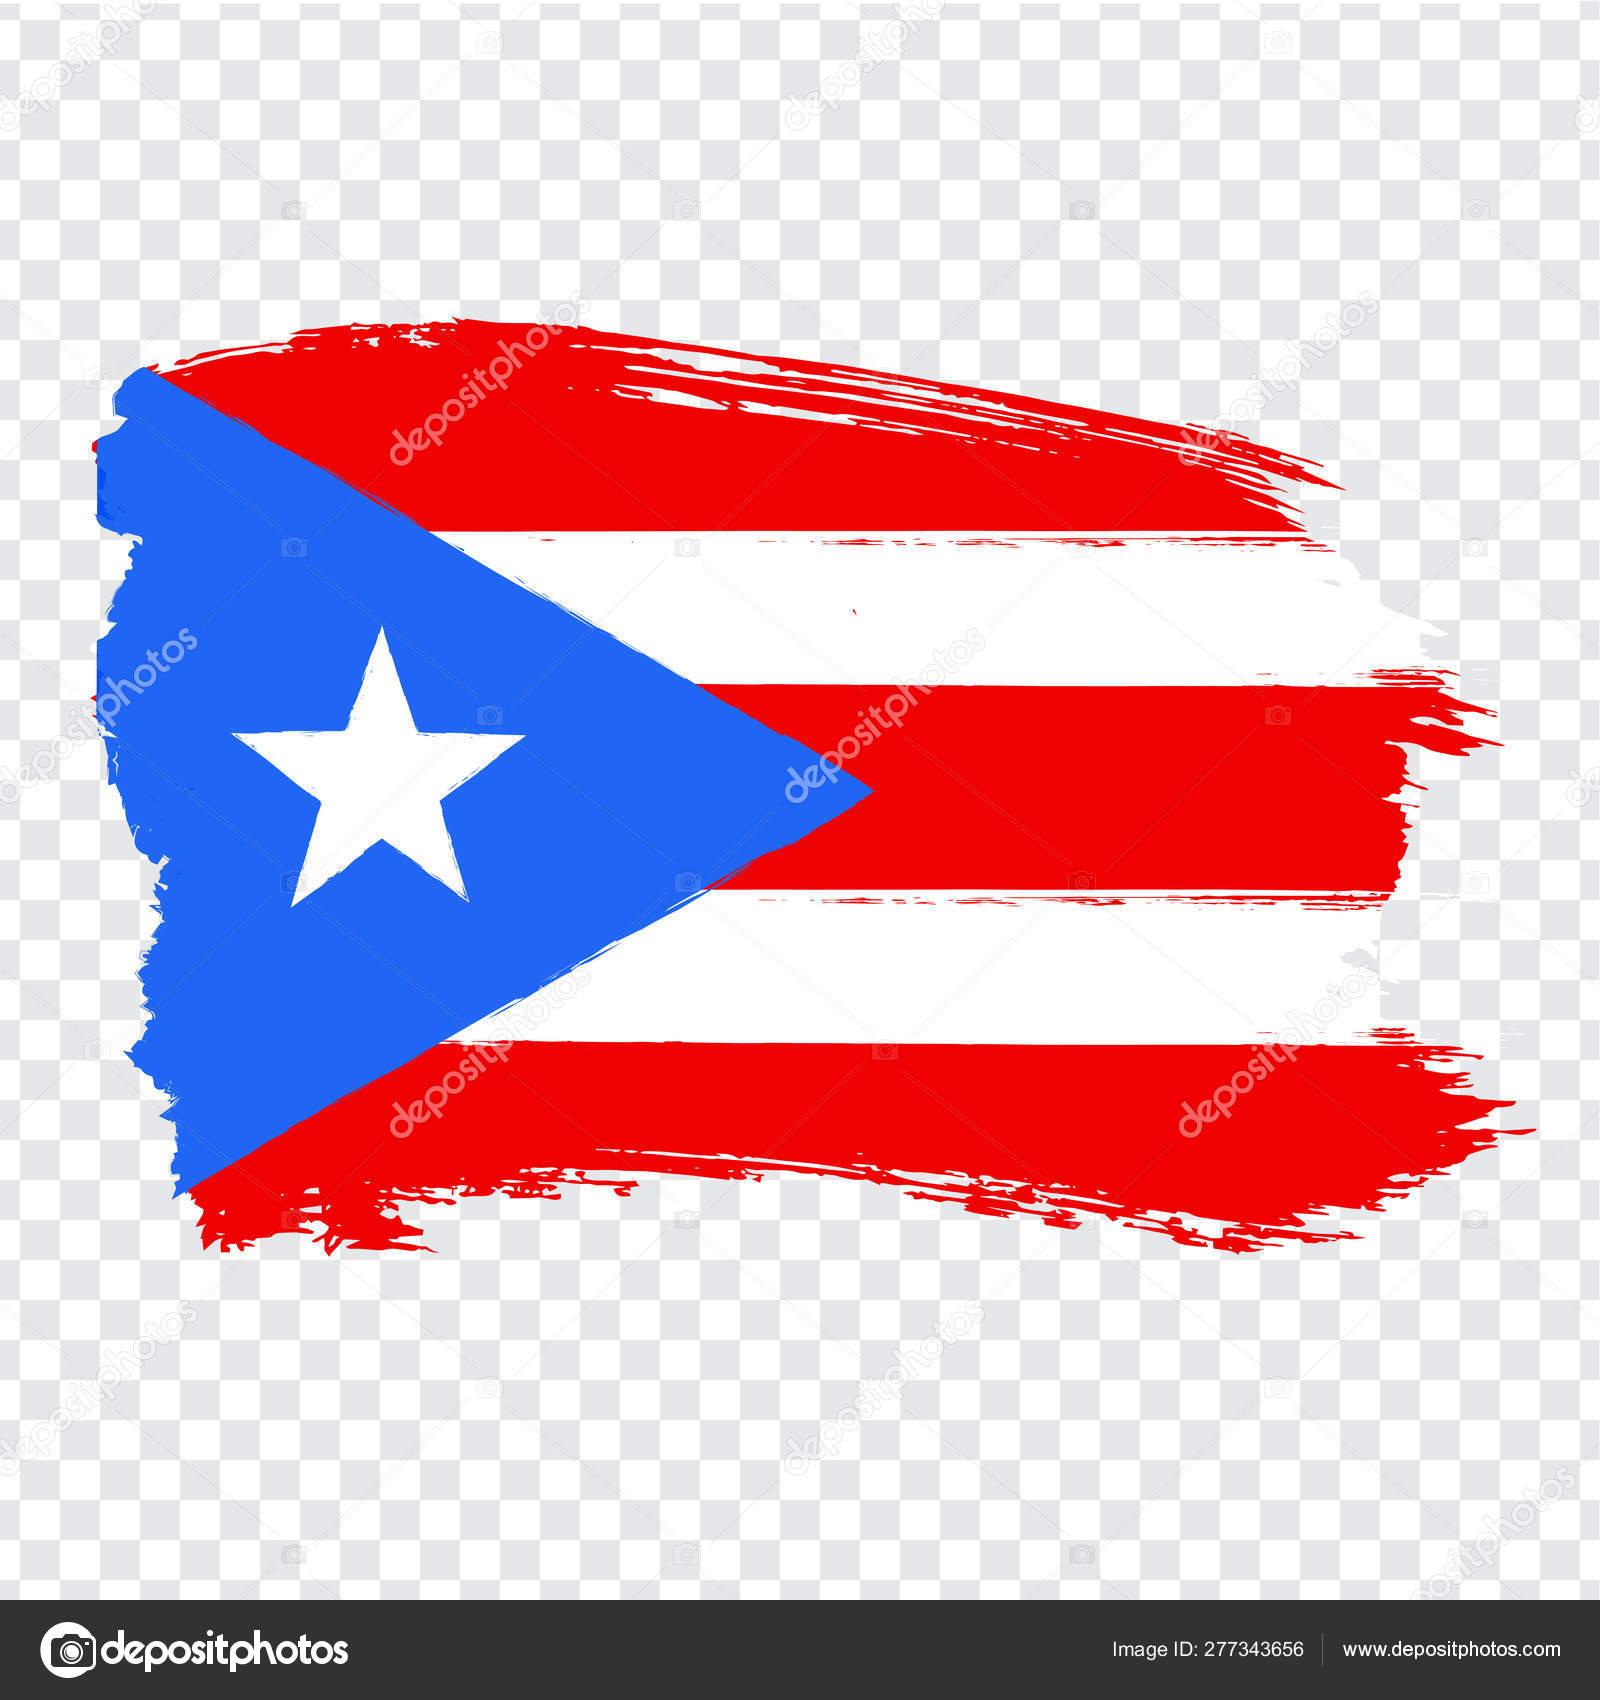 Puerto Rico Pictures Flag - Bilscreen